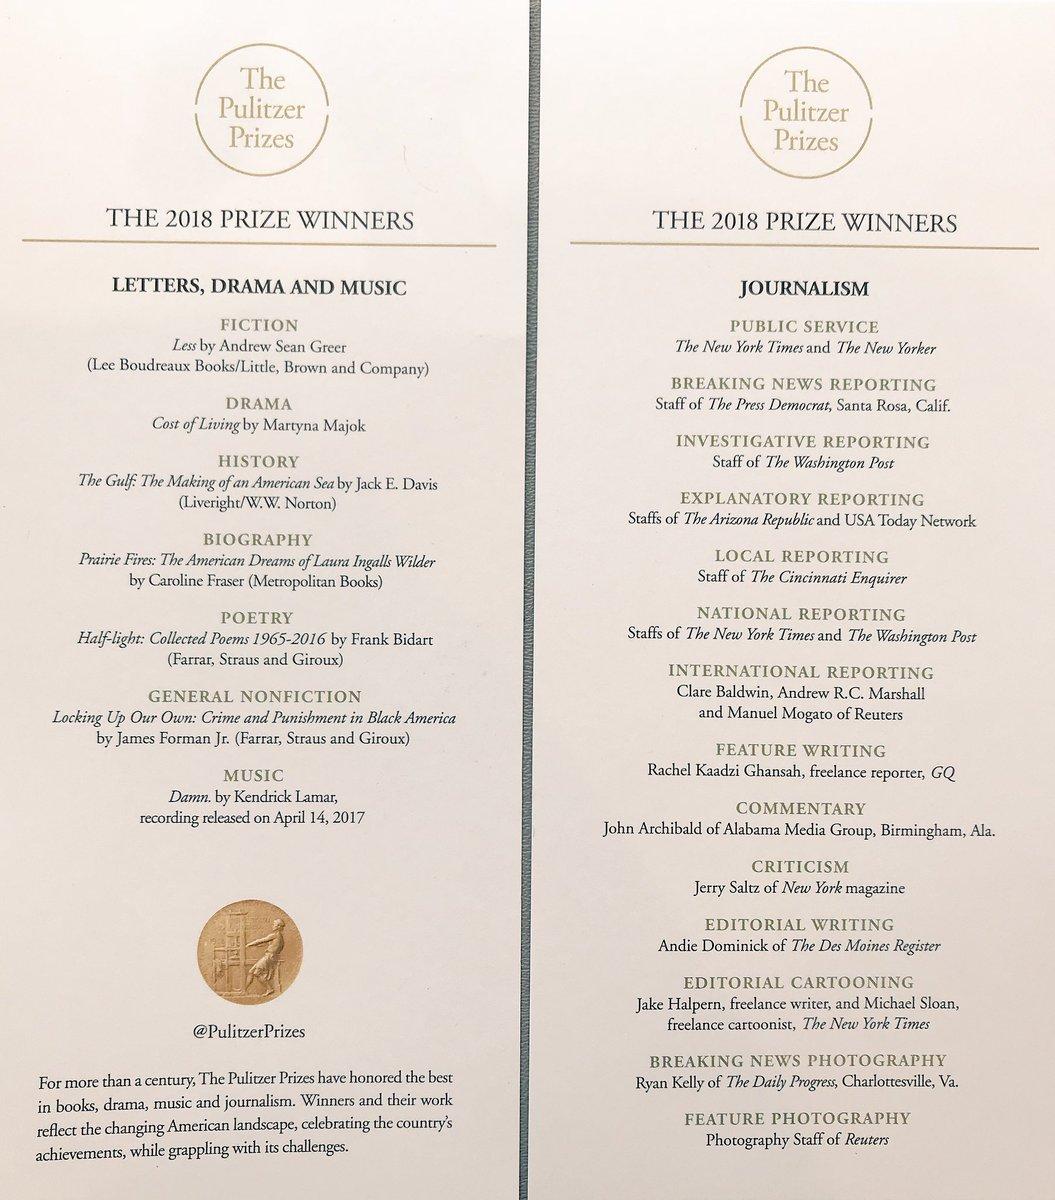 The 2018 #Pulitzer winners  @PulitzerPrizes<br>http://pic.twitter.com/p3nWZ9hny6